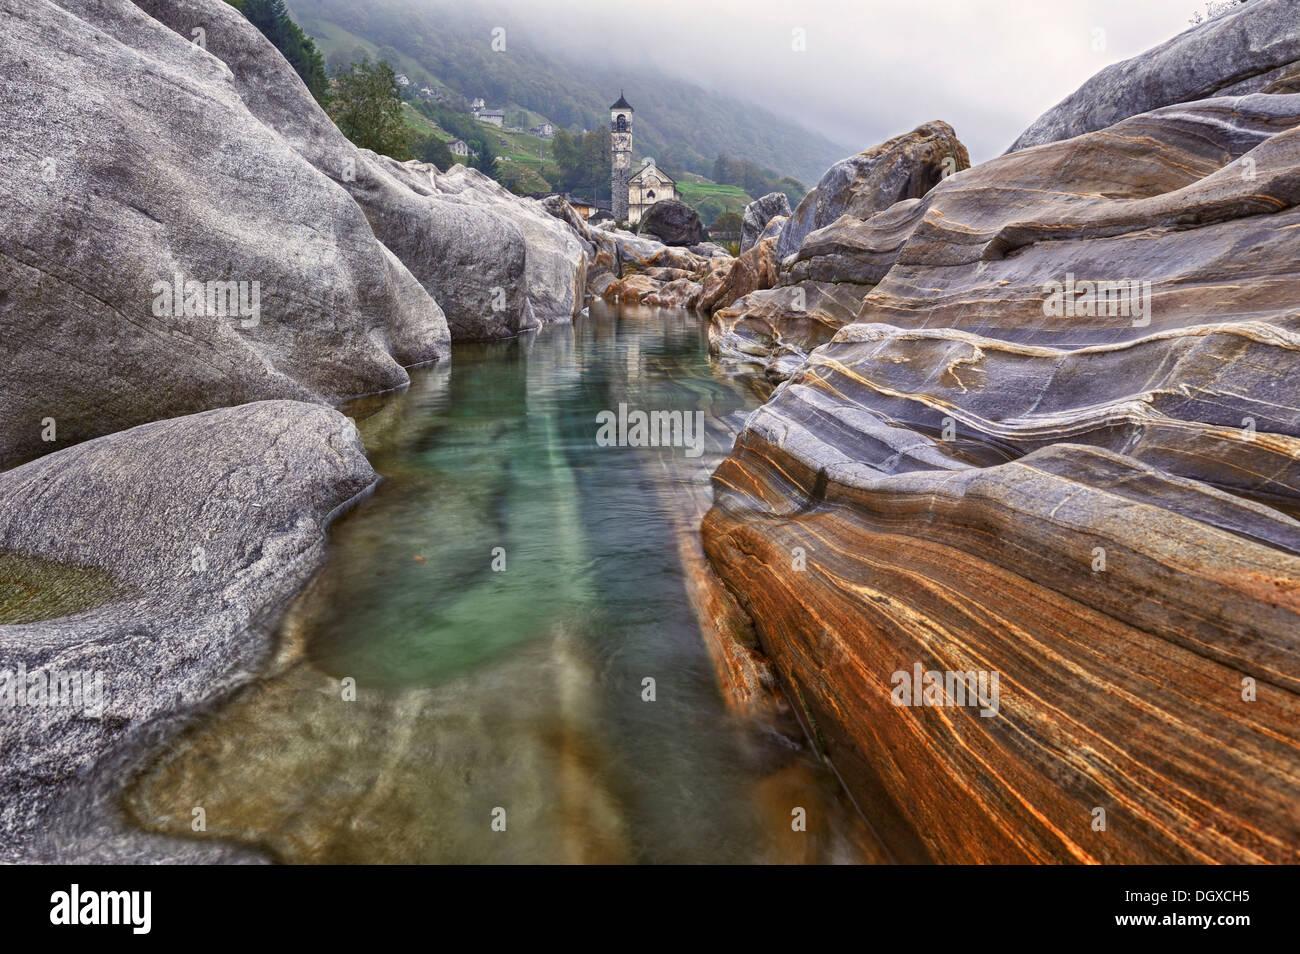 Abraded stones with river water, Lavertezzo, Valle Verzasca, Verzasca Valley, Ticino, Switzerland, Europe Stock Photo